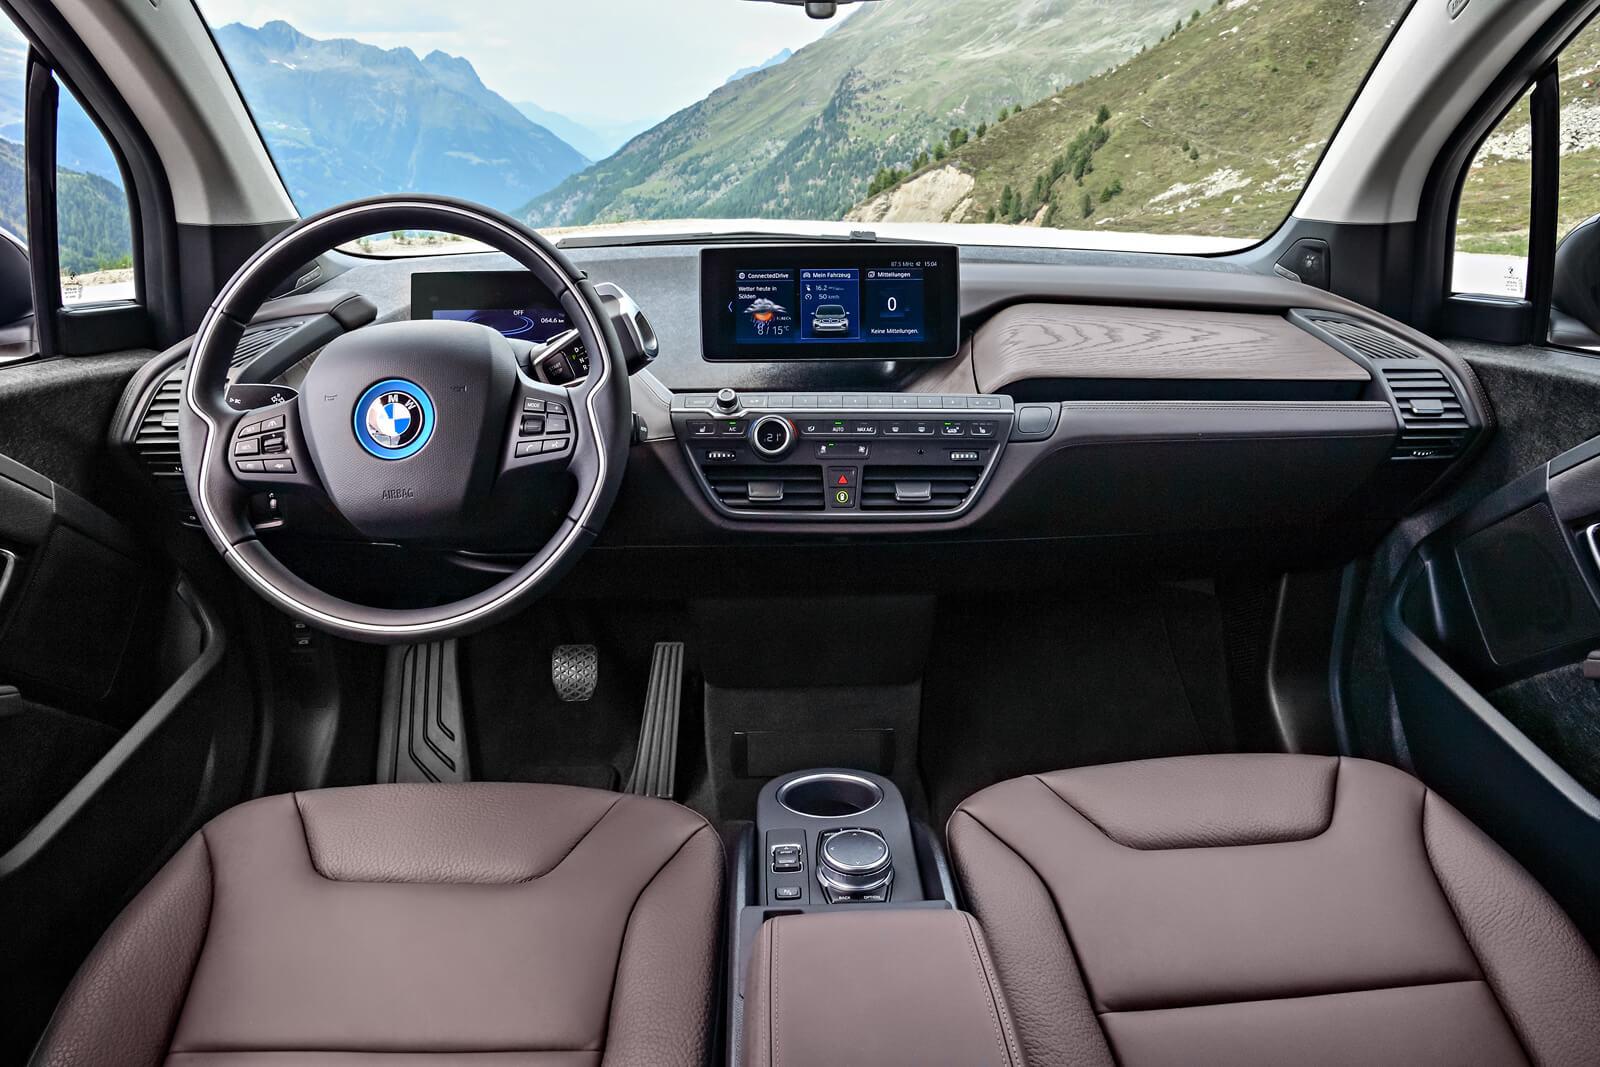 BMW i3 Interior Front